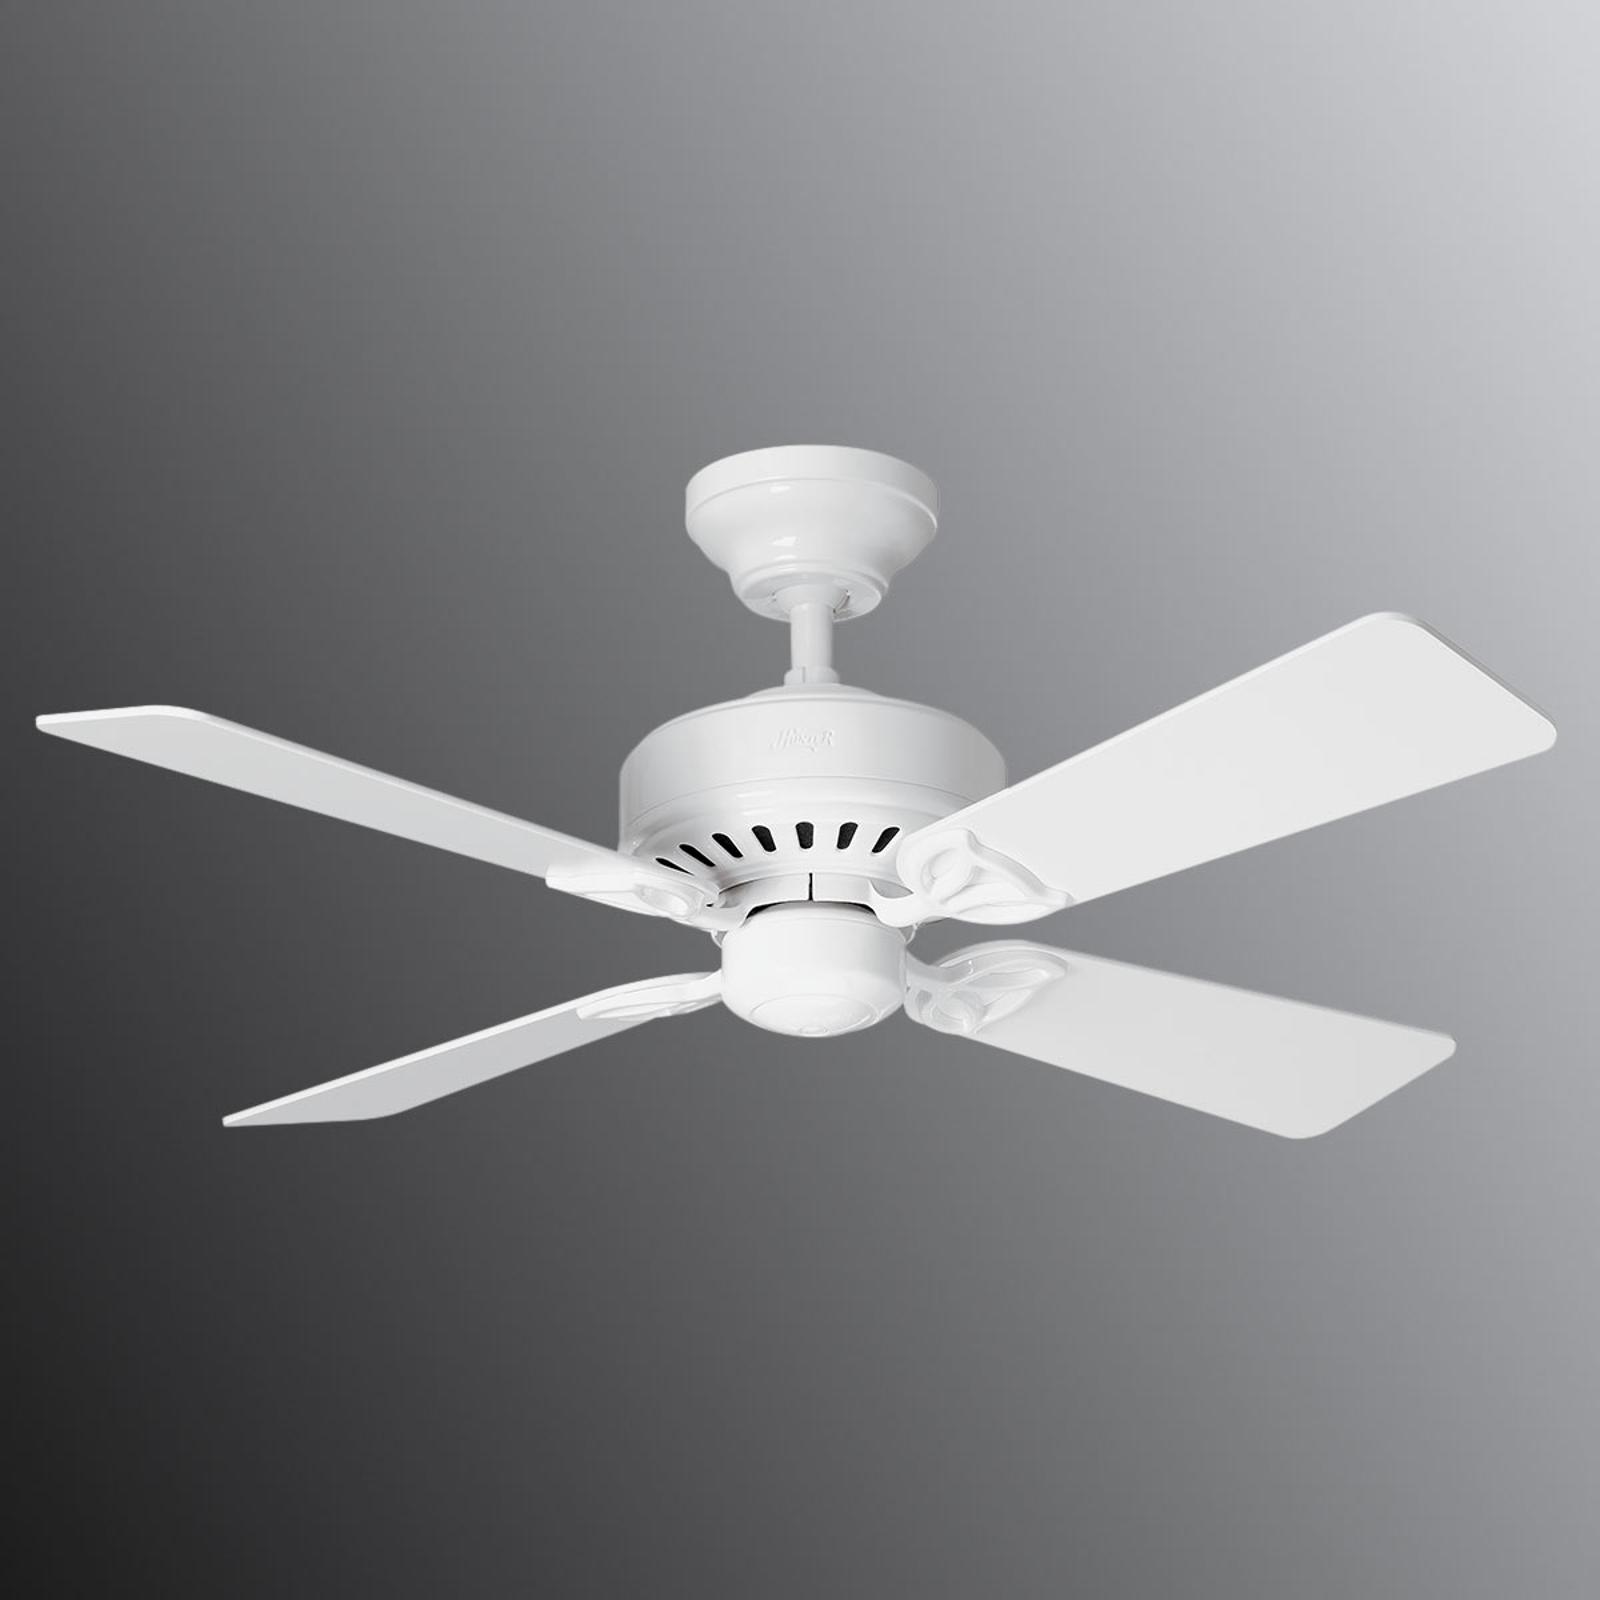 Hunter Bayport ventilateur plafond blanc/chêne